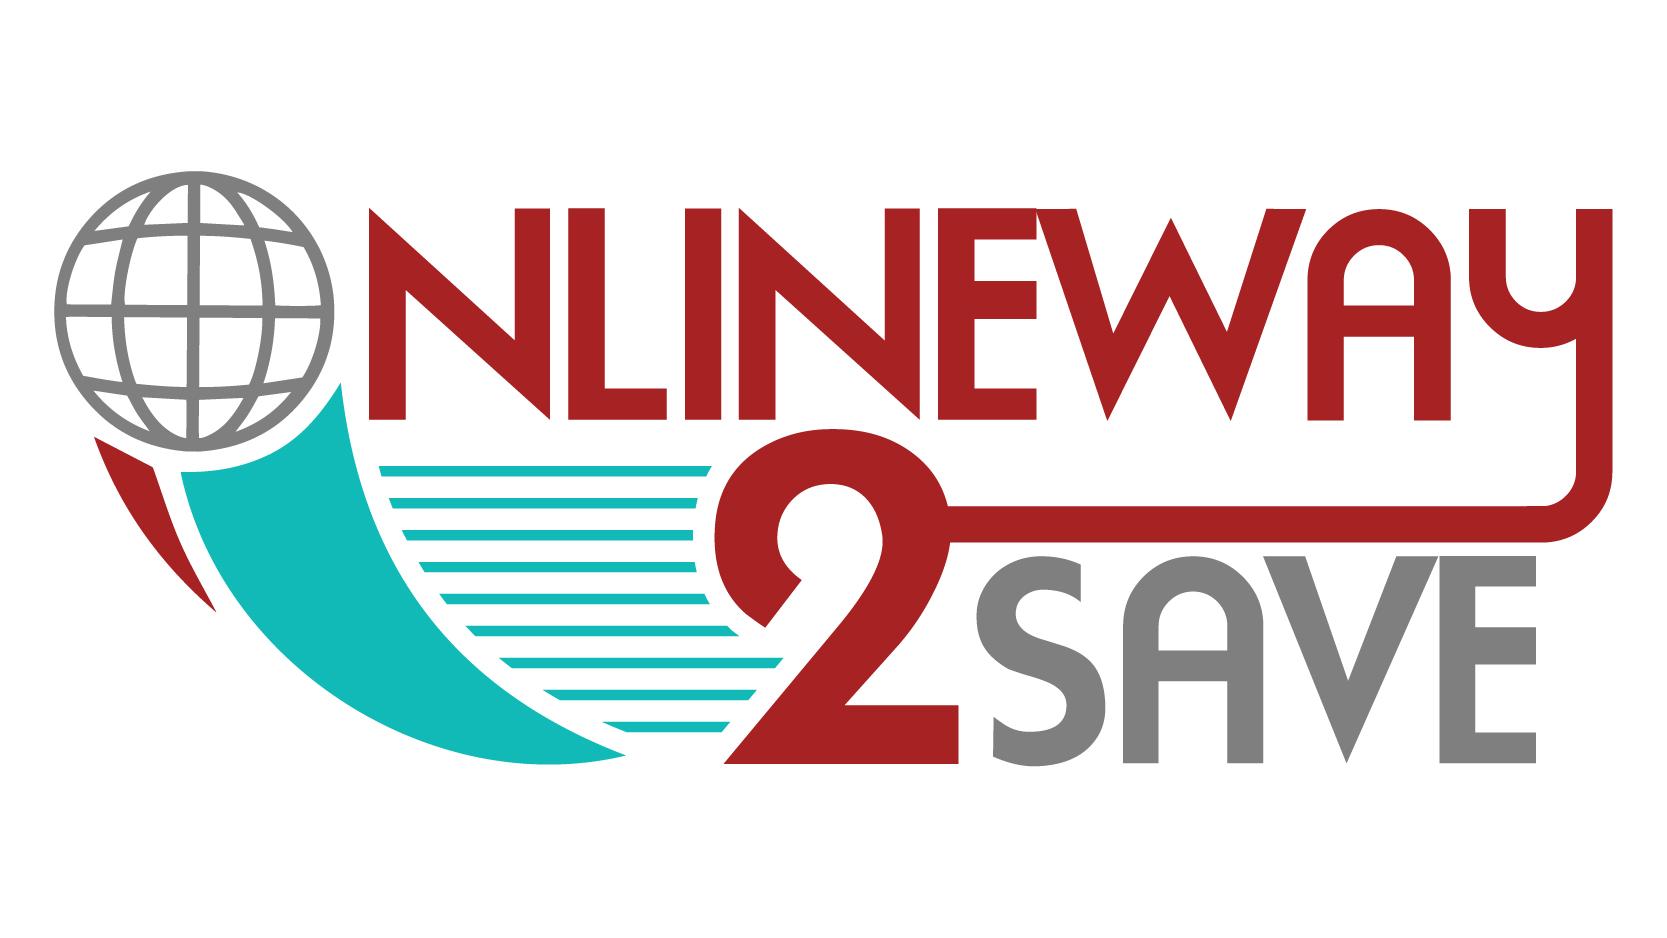 OnLineWay2Save.com